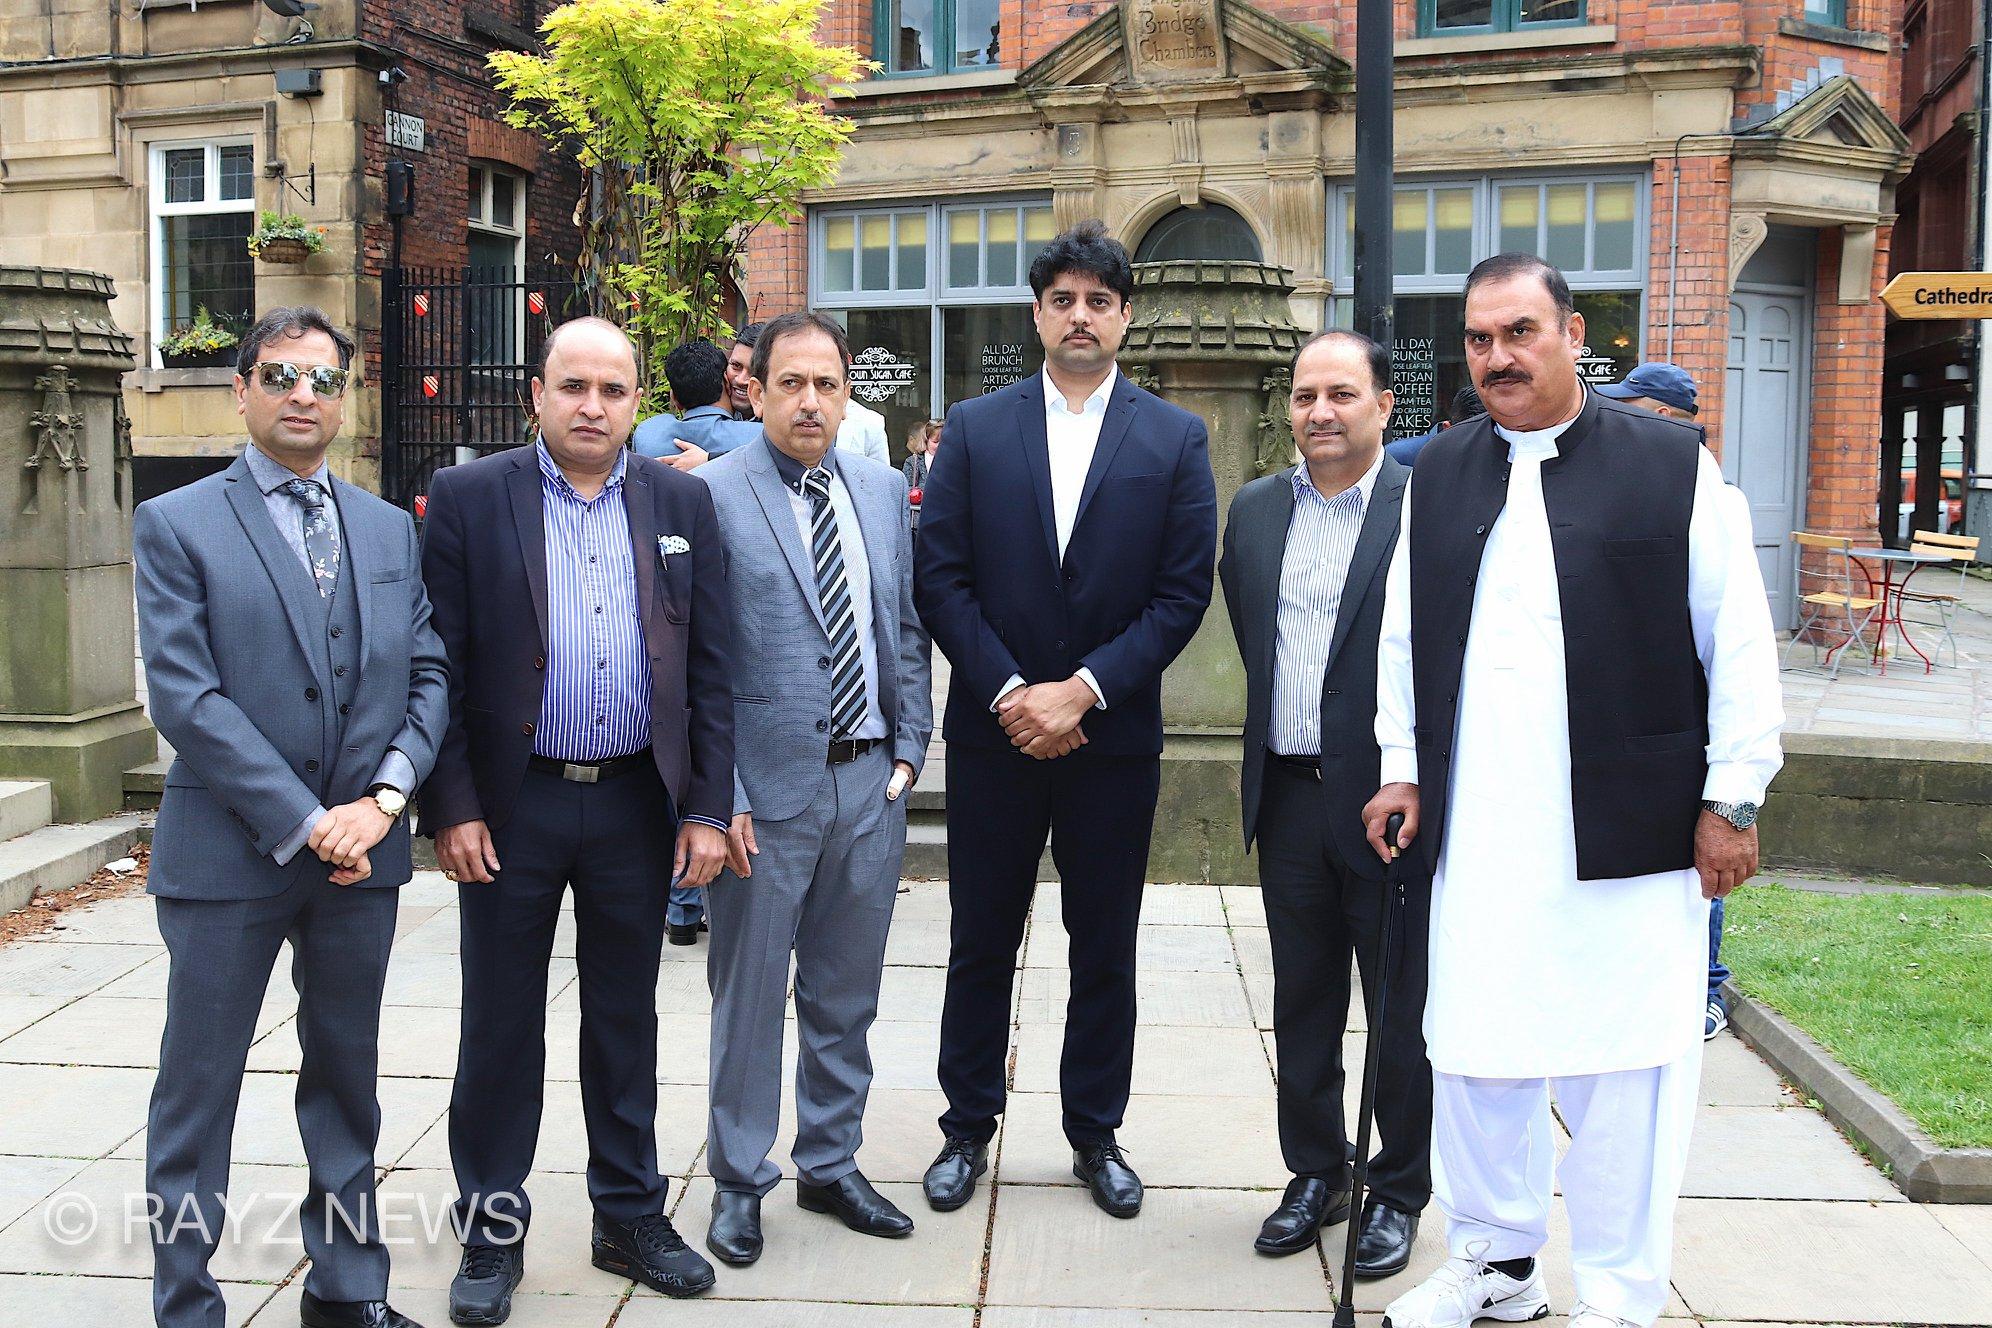 Civic service for newley elected lord mayor abid chohan